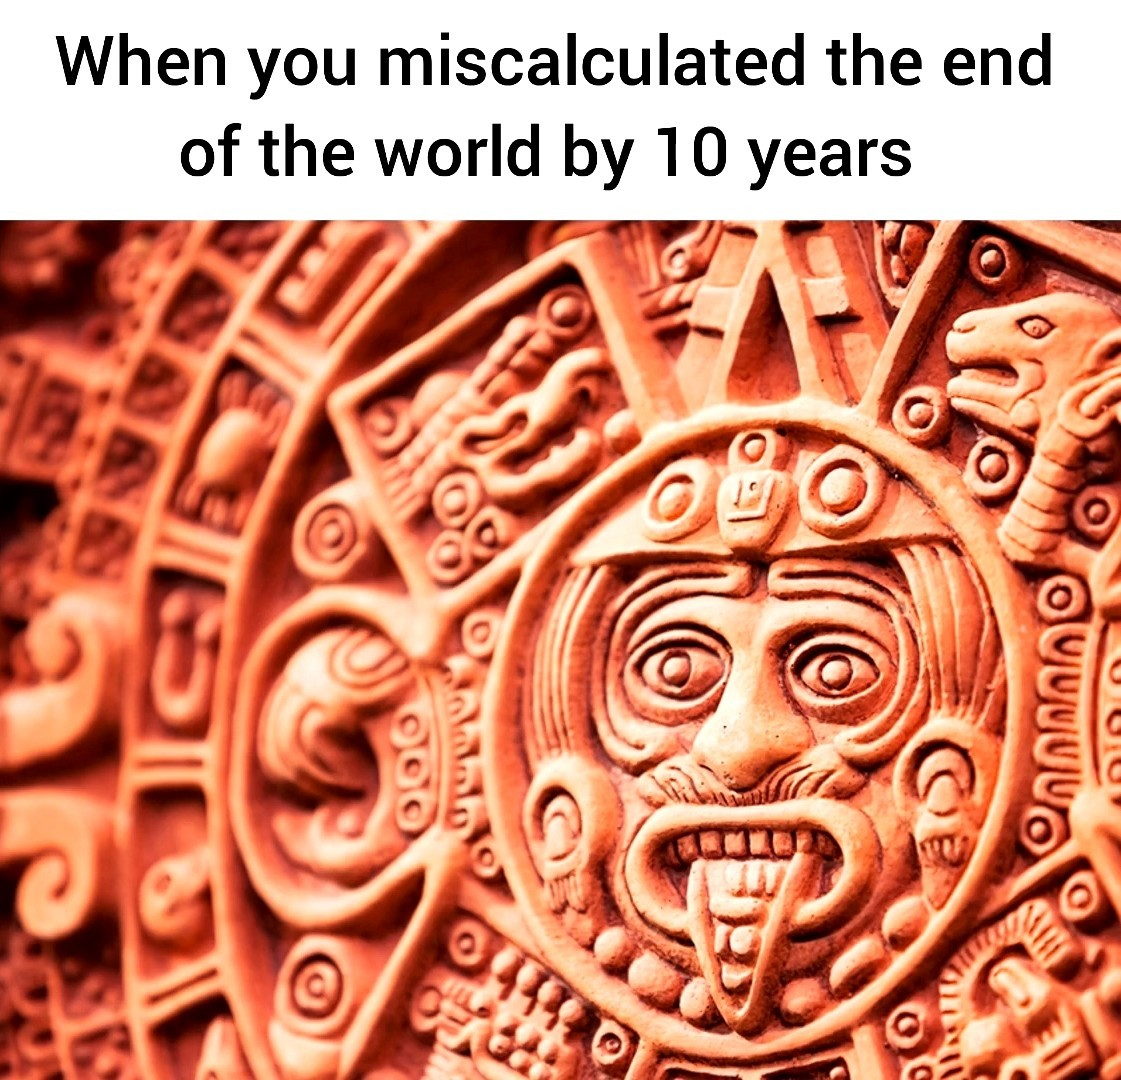 The real doom has come - meme